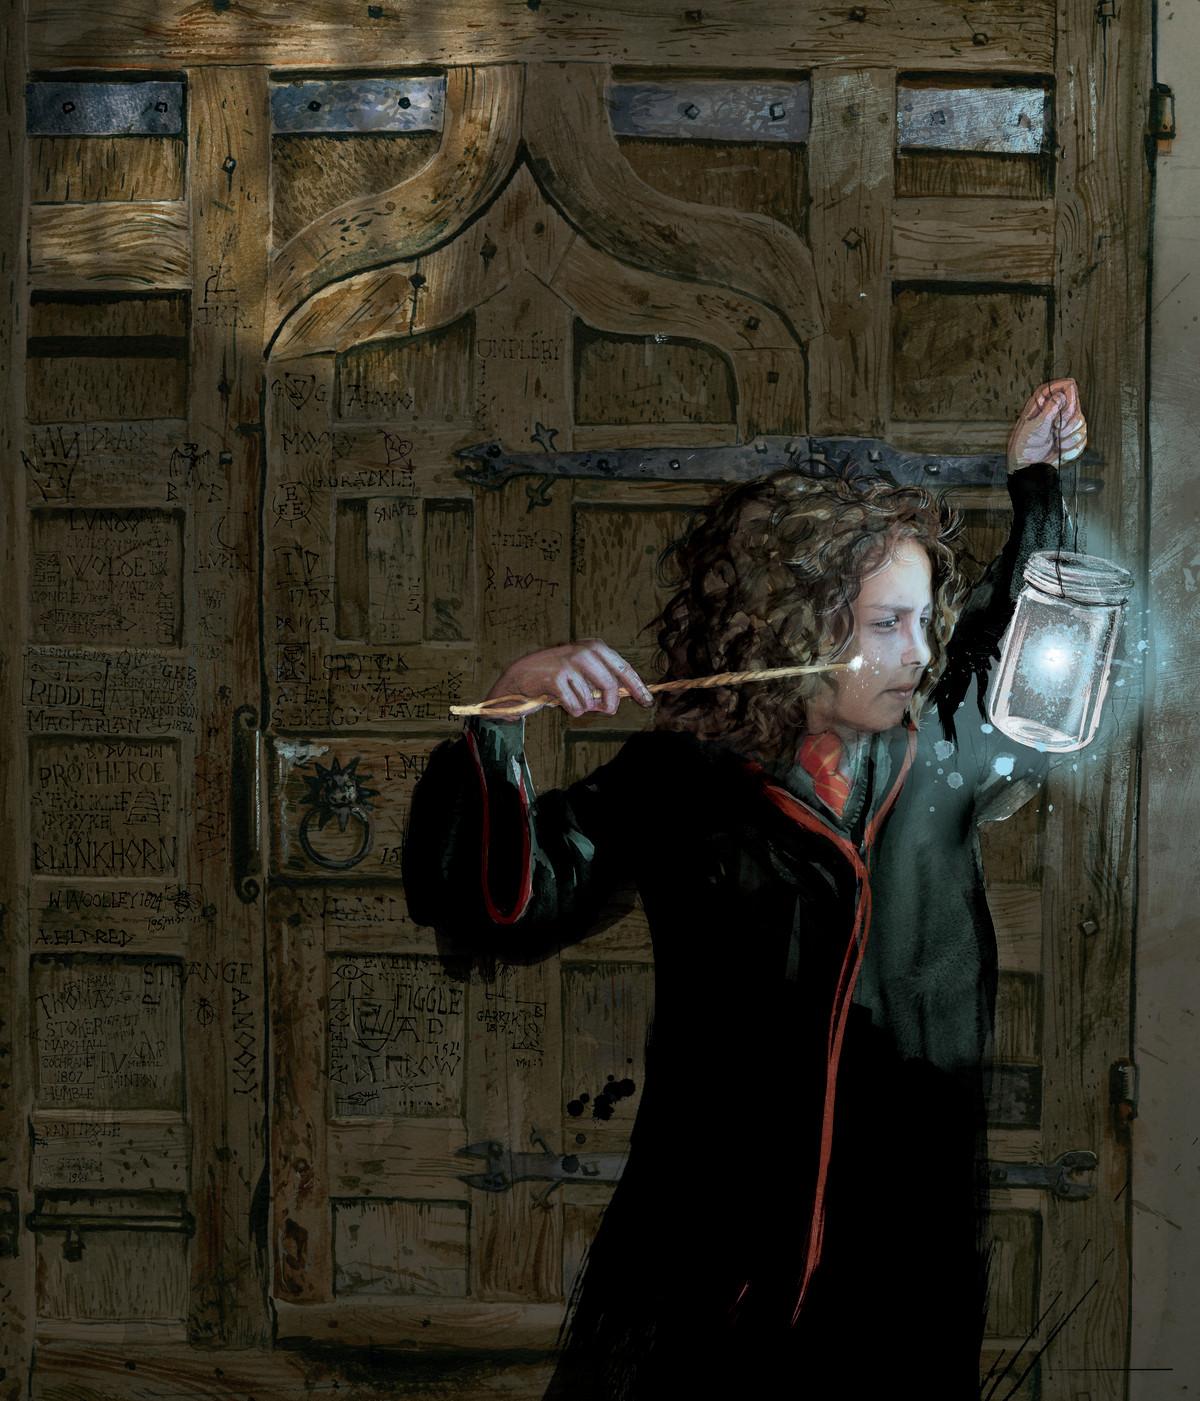 Artist Jim Kay on illustrating Harry Potter | Wizarding World